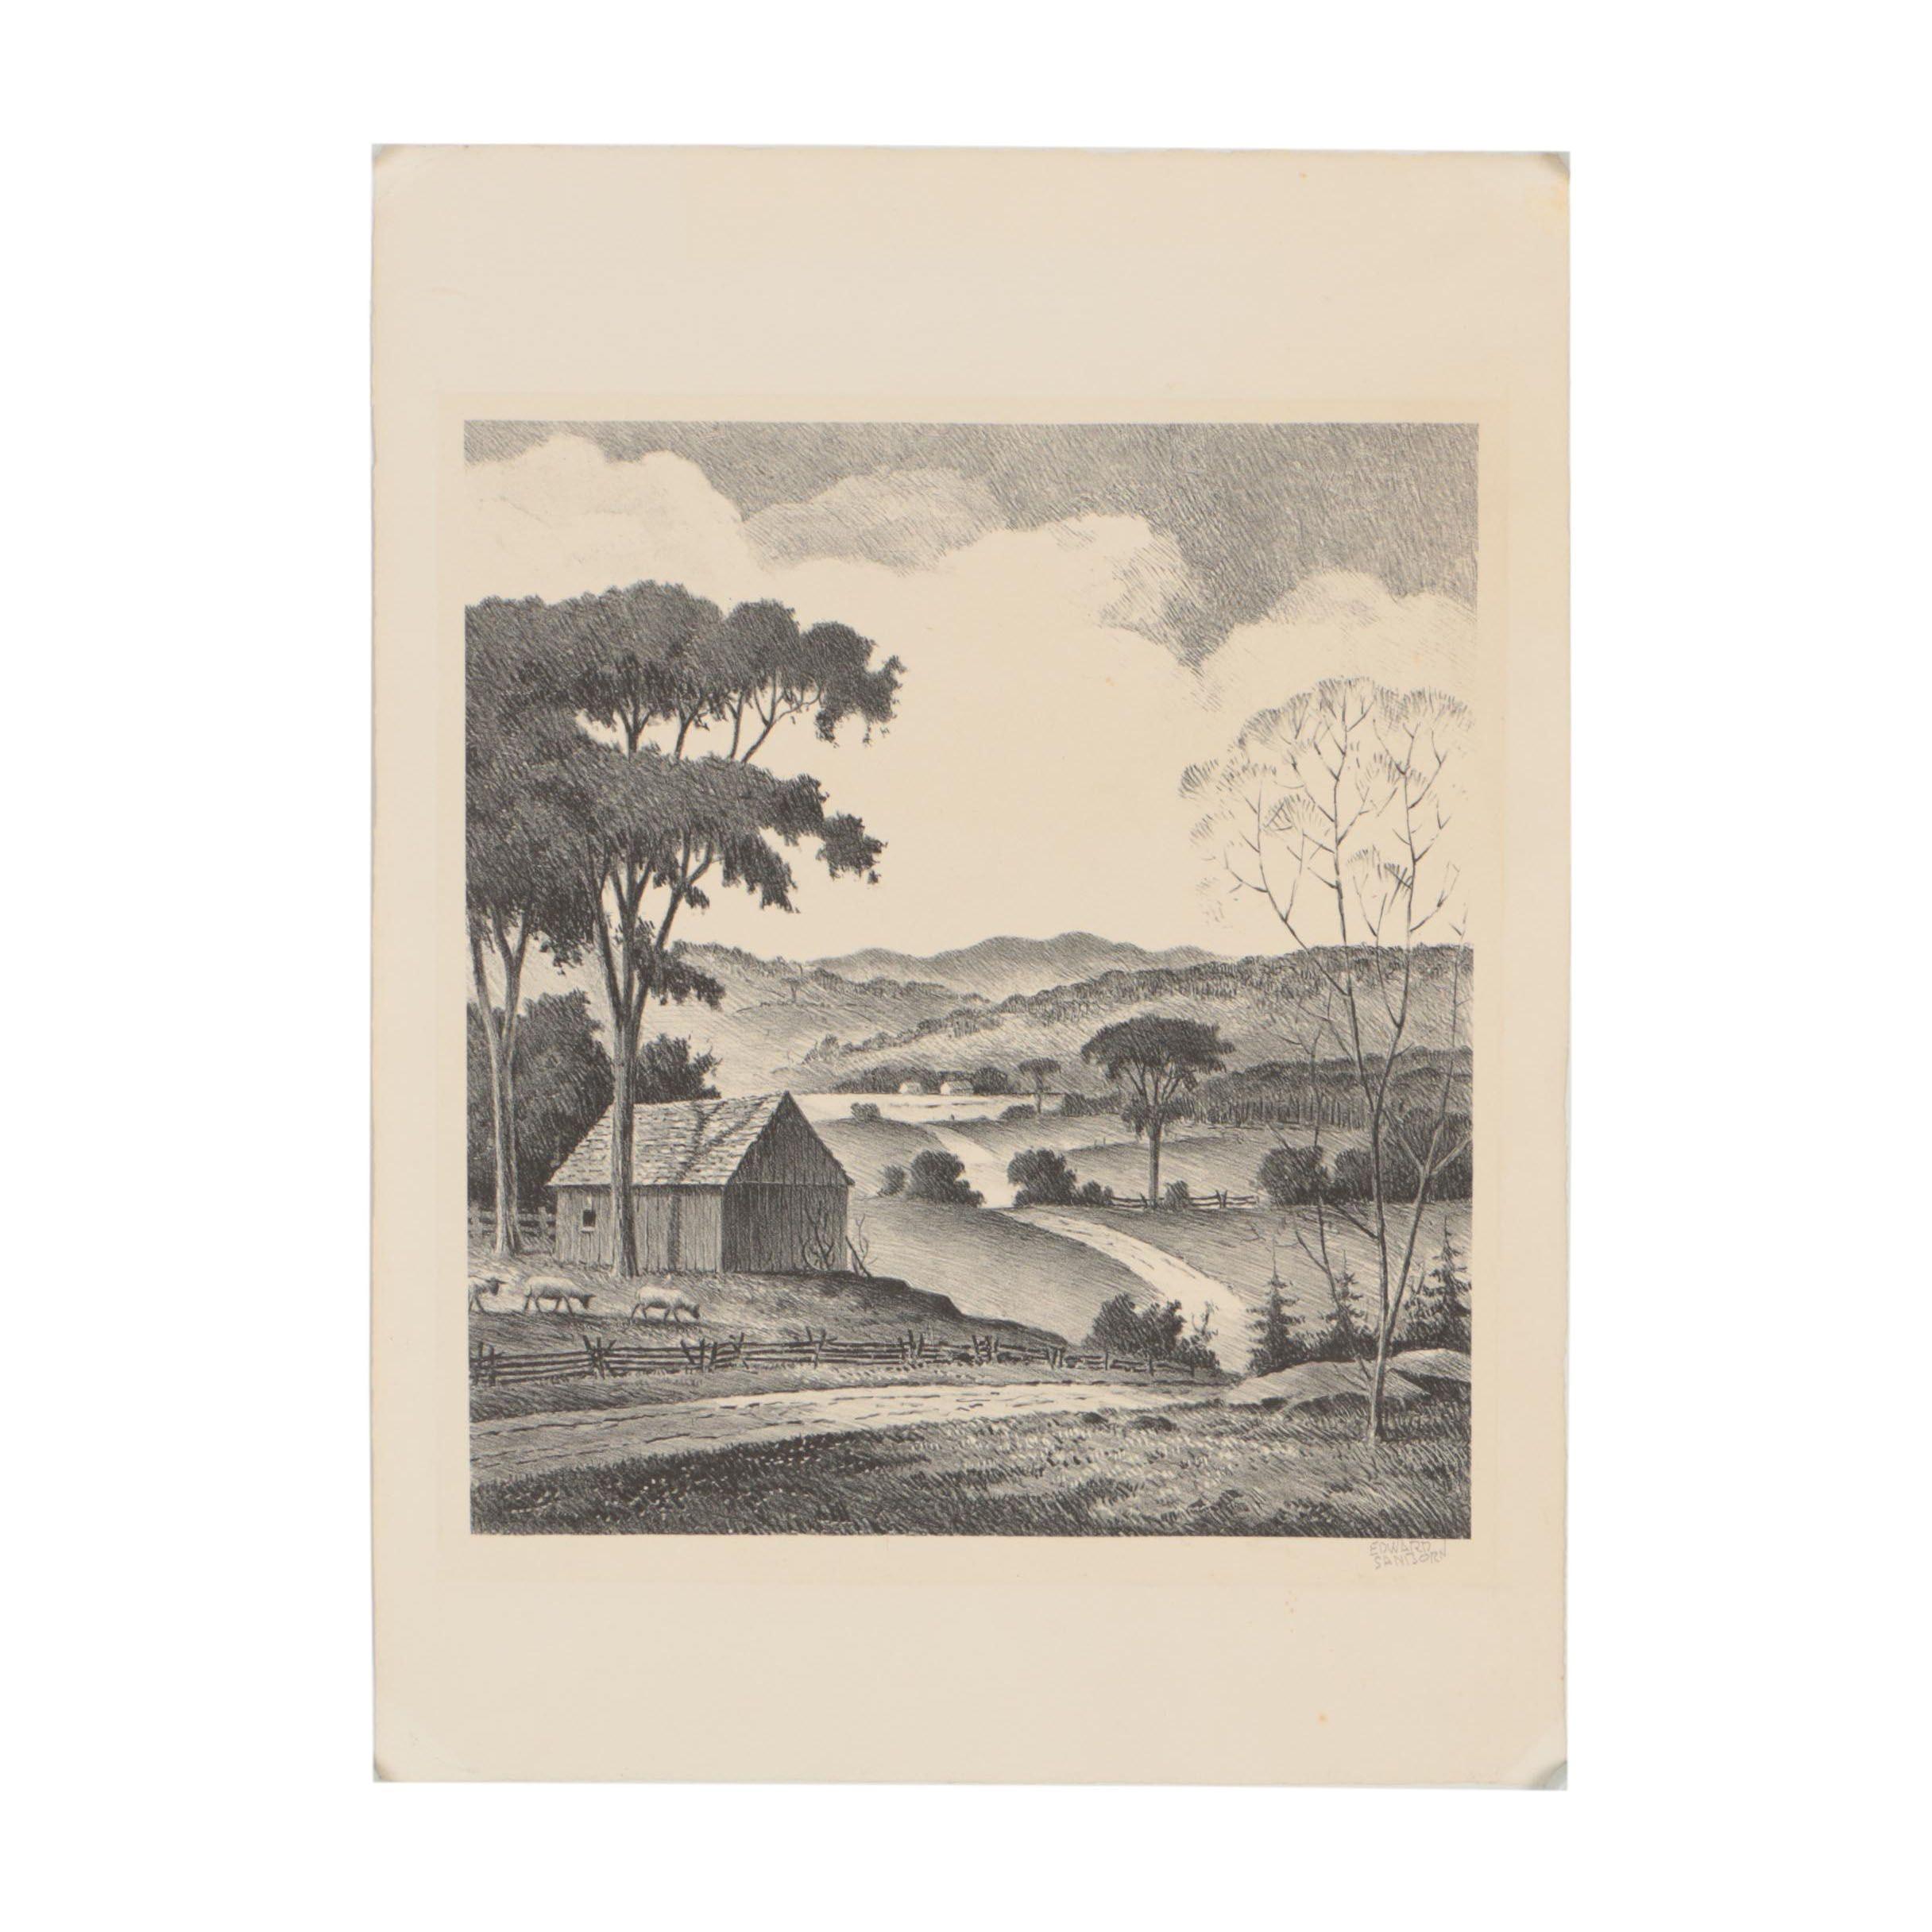 Edward Sanborn Lithograph of Rural Landscape